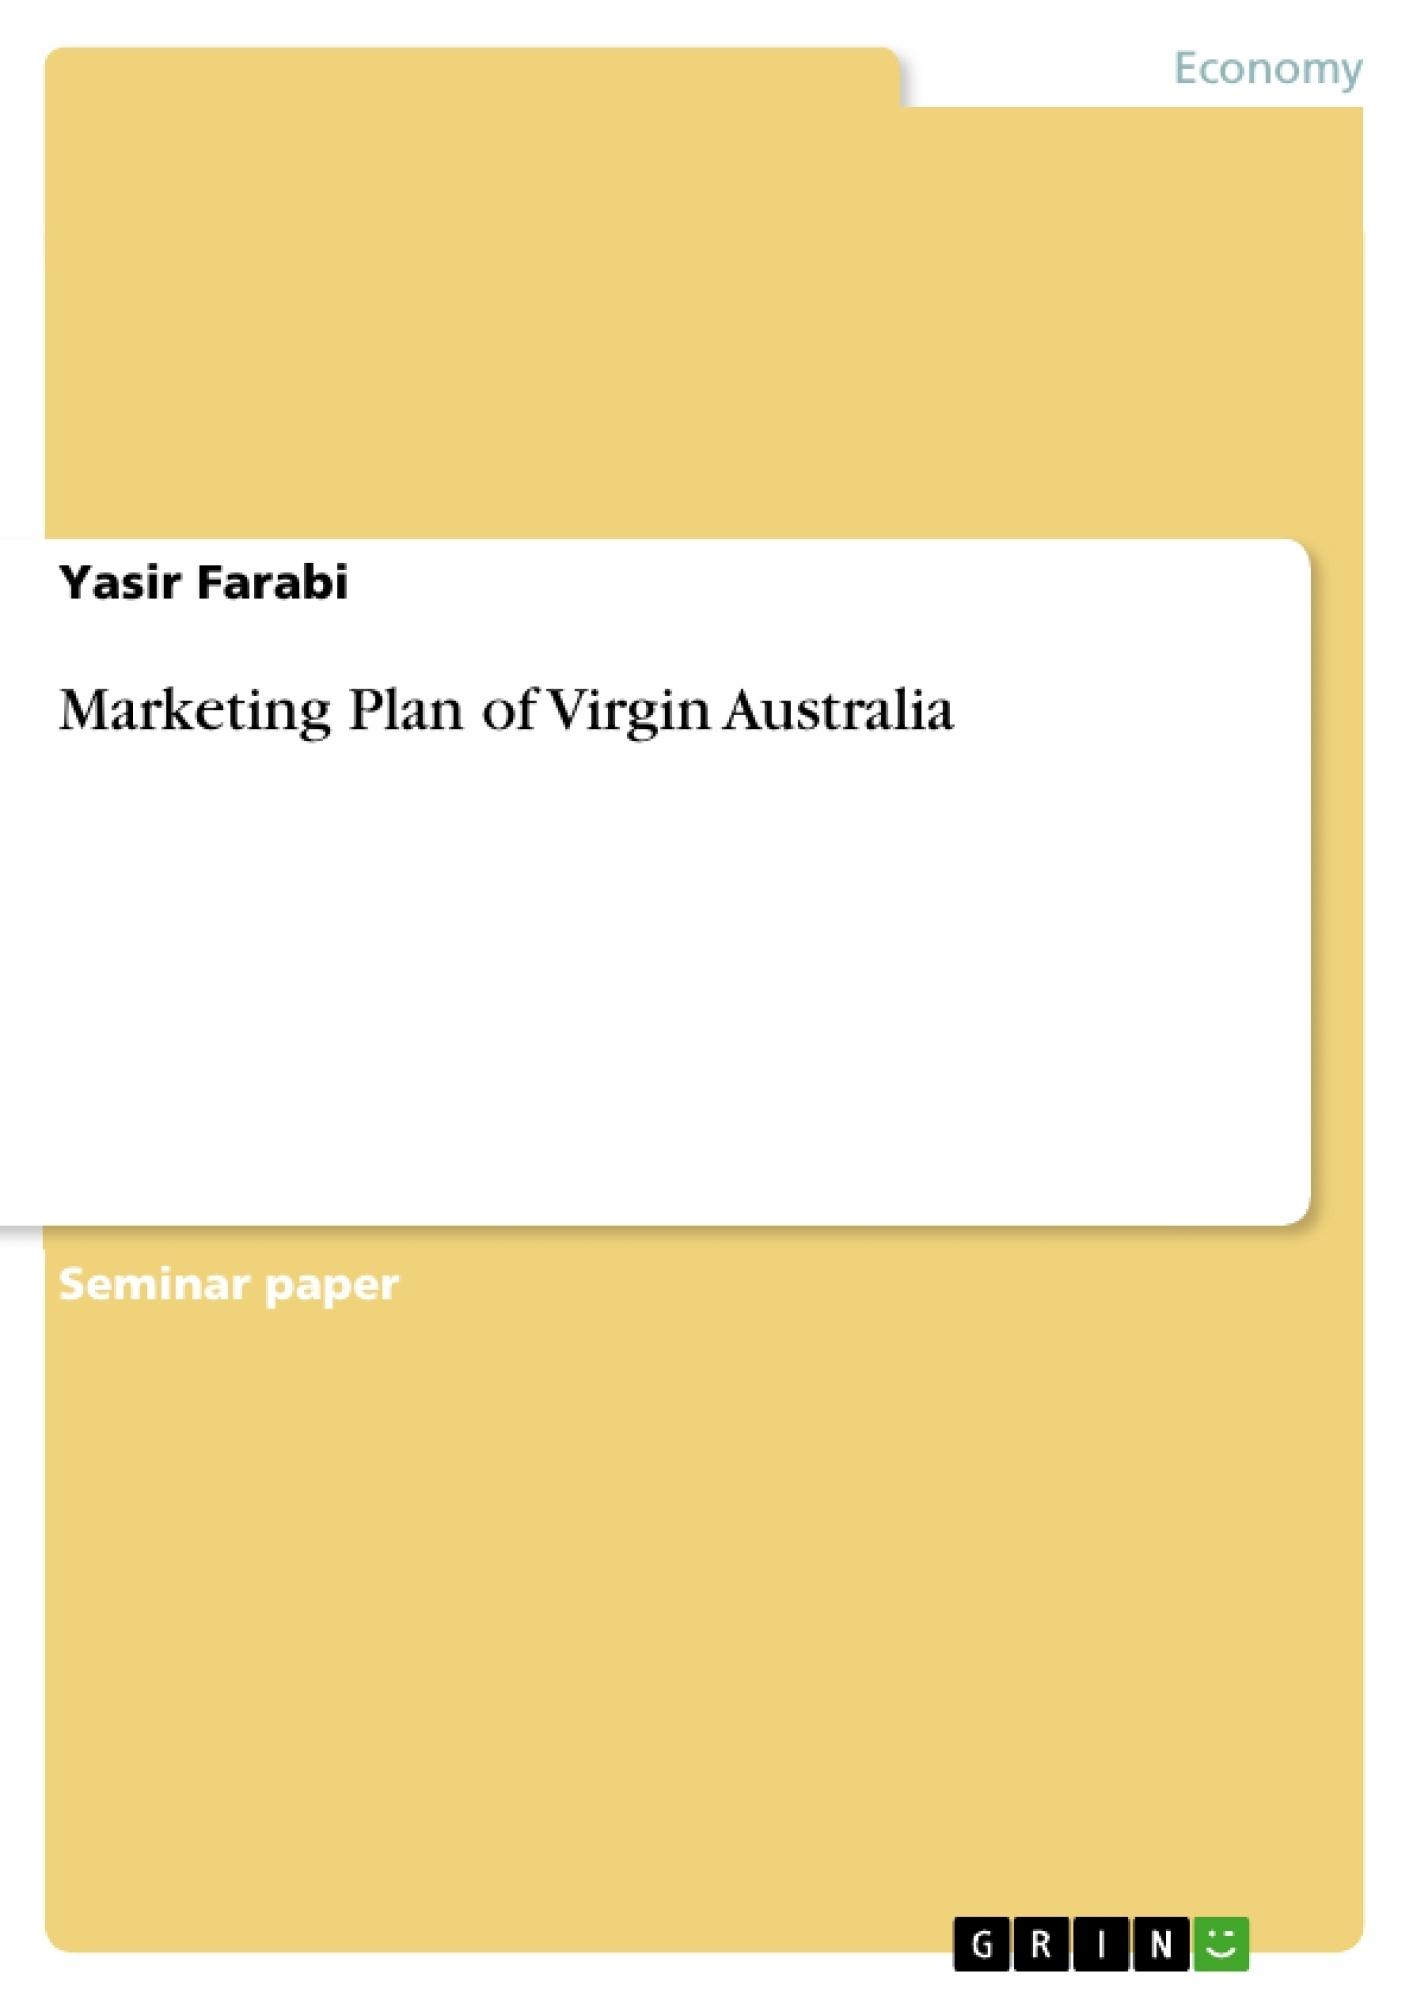 virgin group financial statements